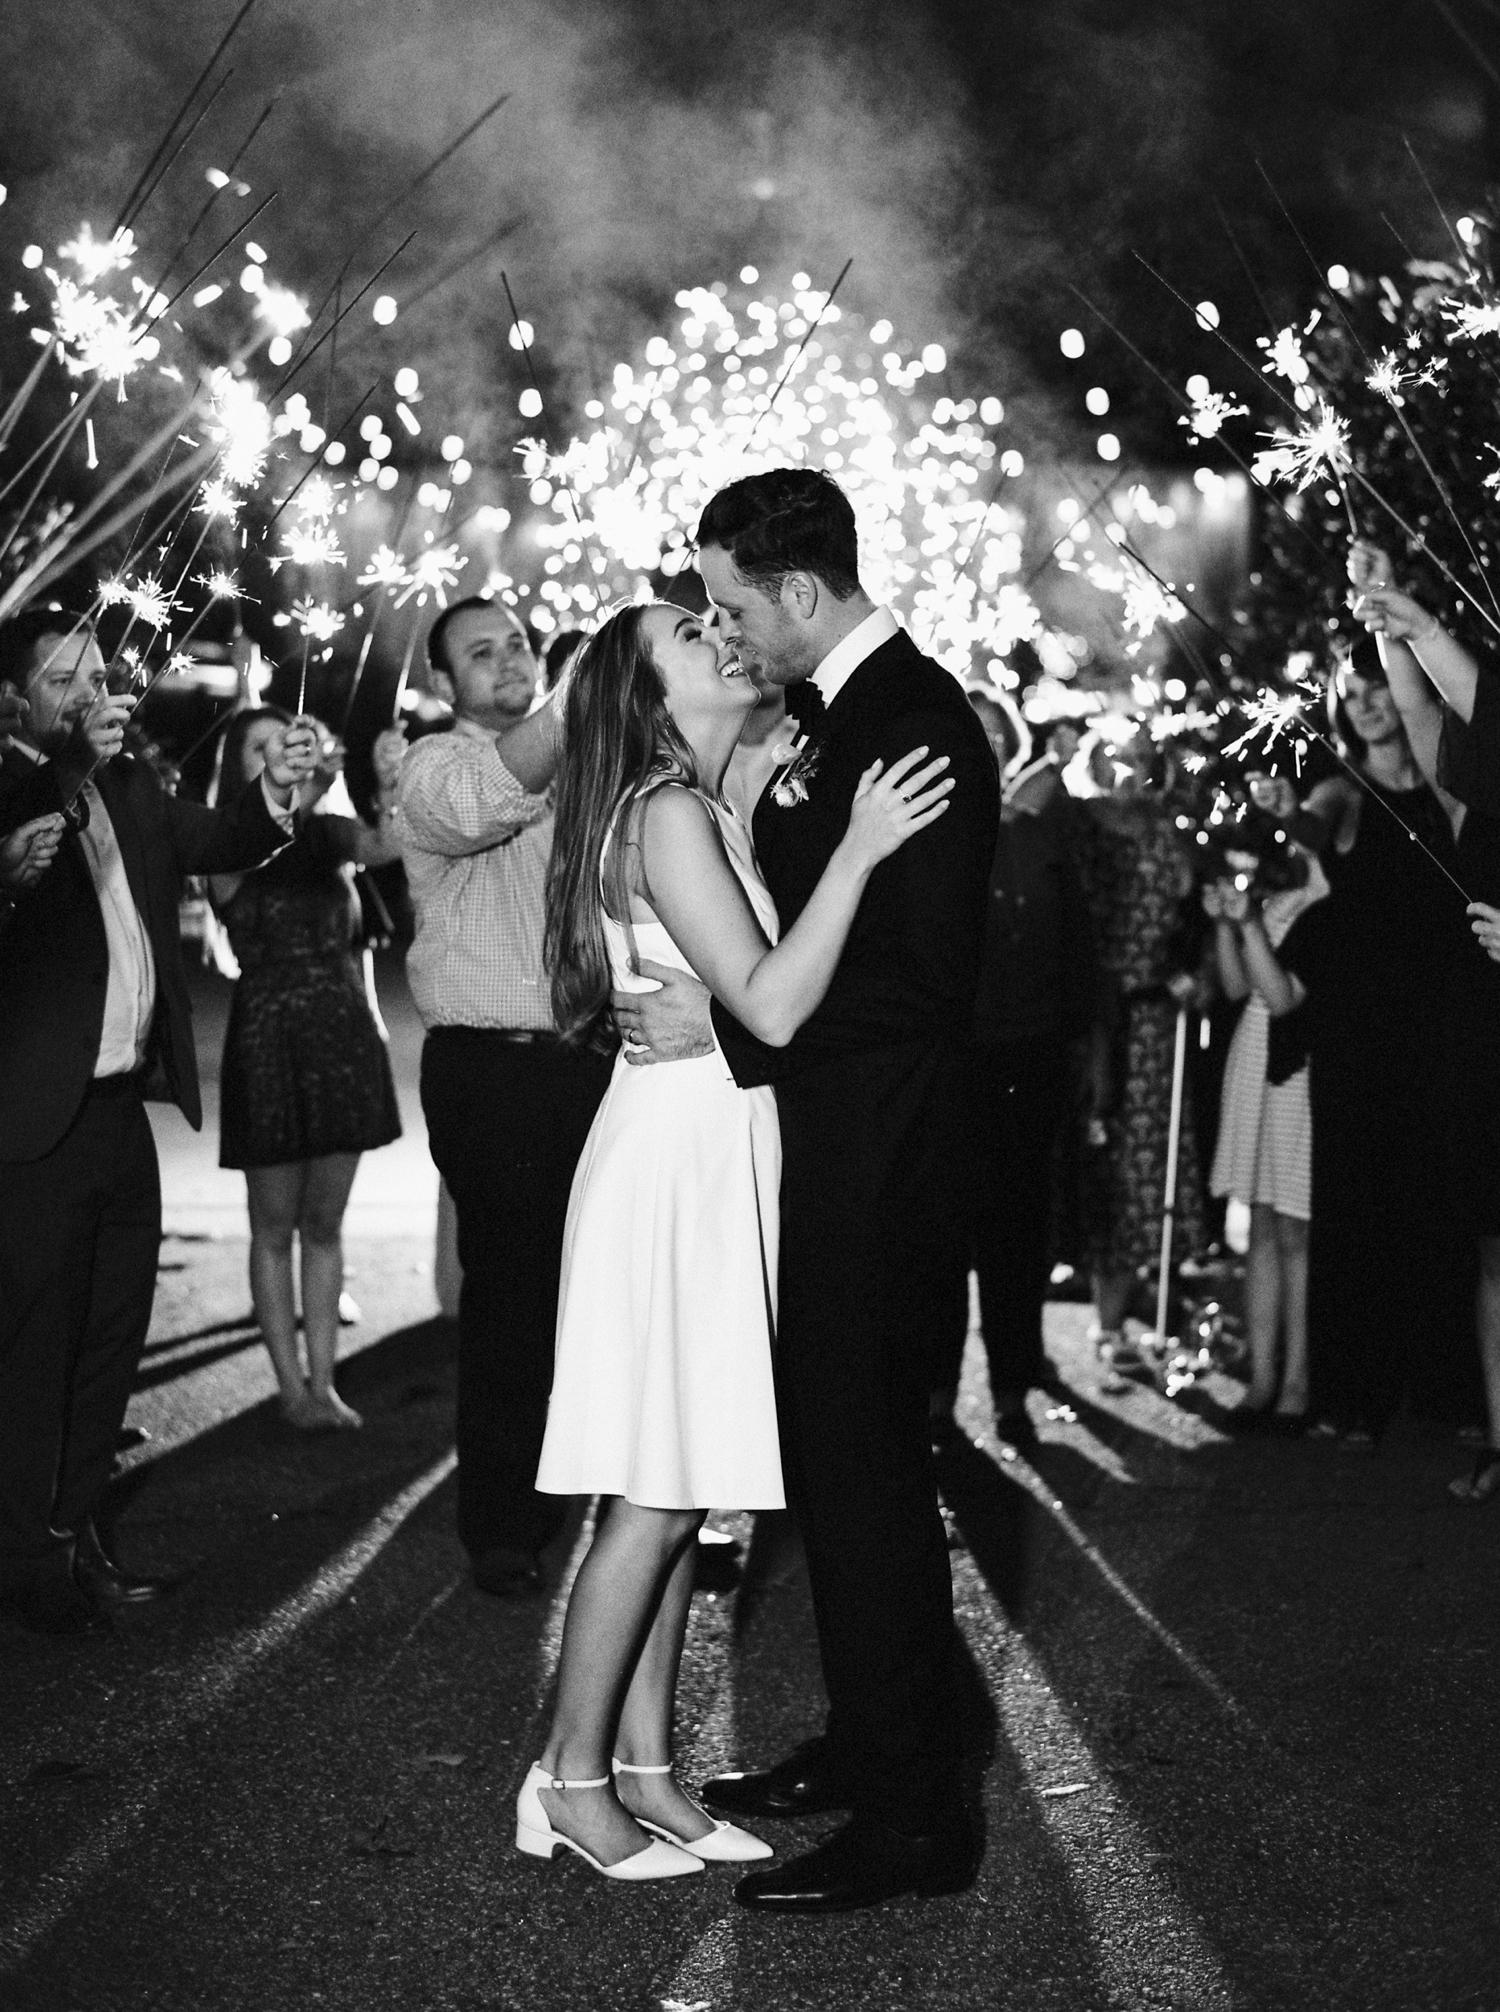 Calgary wedding photographers | georgia wedding photographers | fine art film | Justine Milton Photography | georgia wedding | first dance | bride and groom portraits | sparklers | wedding party